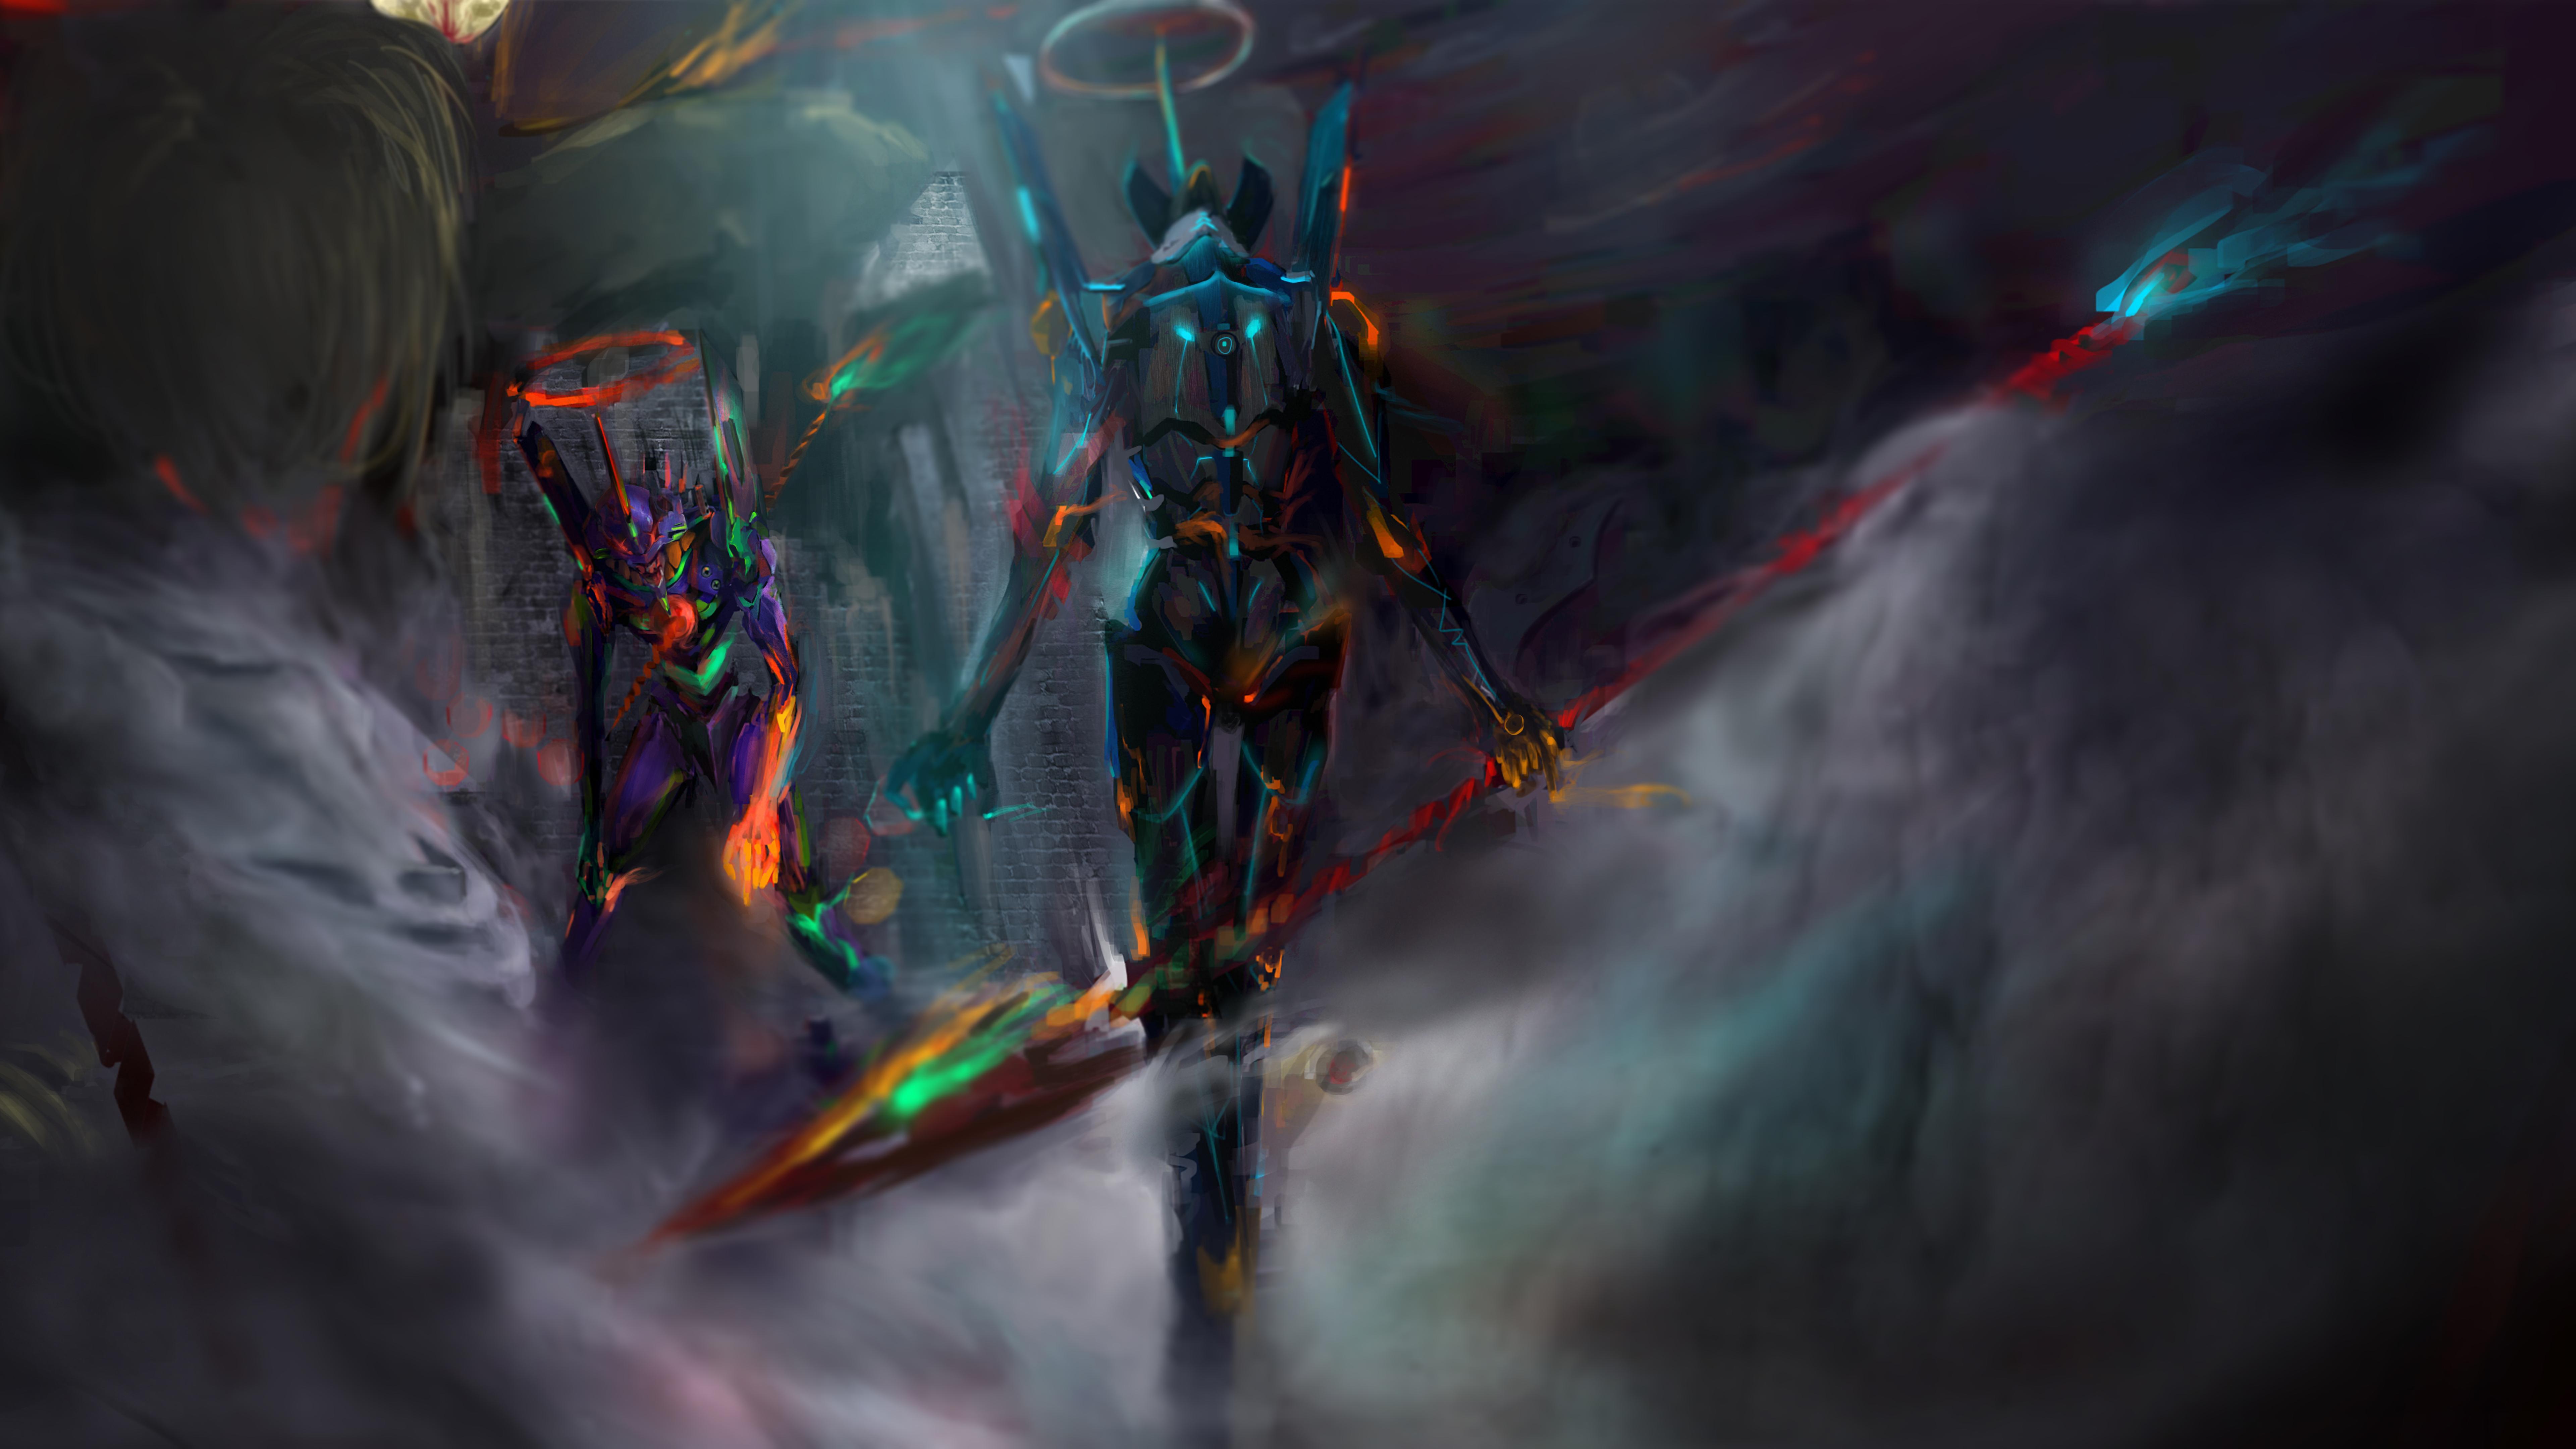 7680x4320 Neon Genesis Evangelion 12k 8k HD 4k Wallpapers